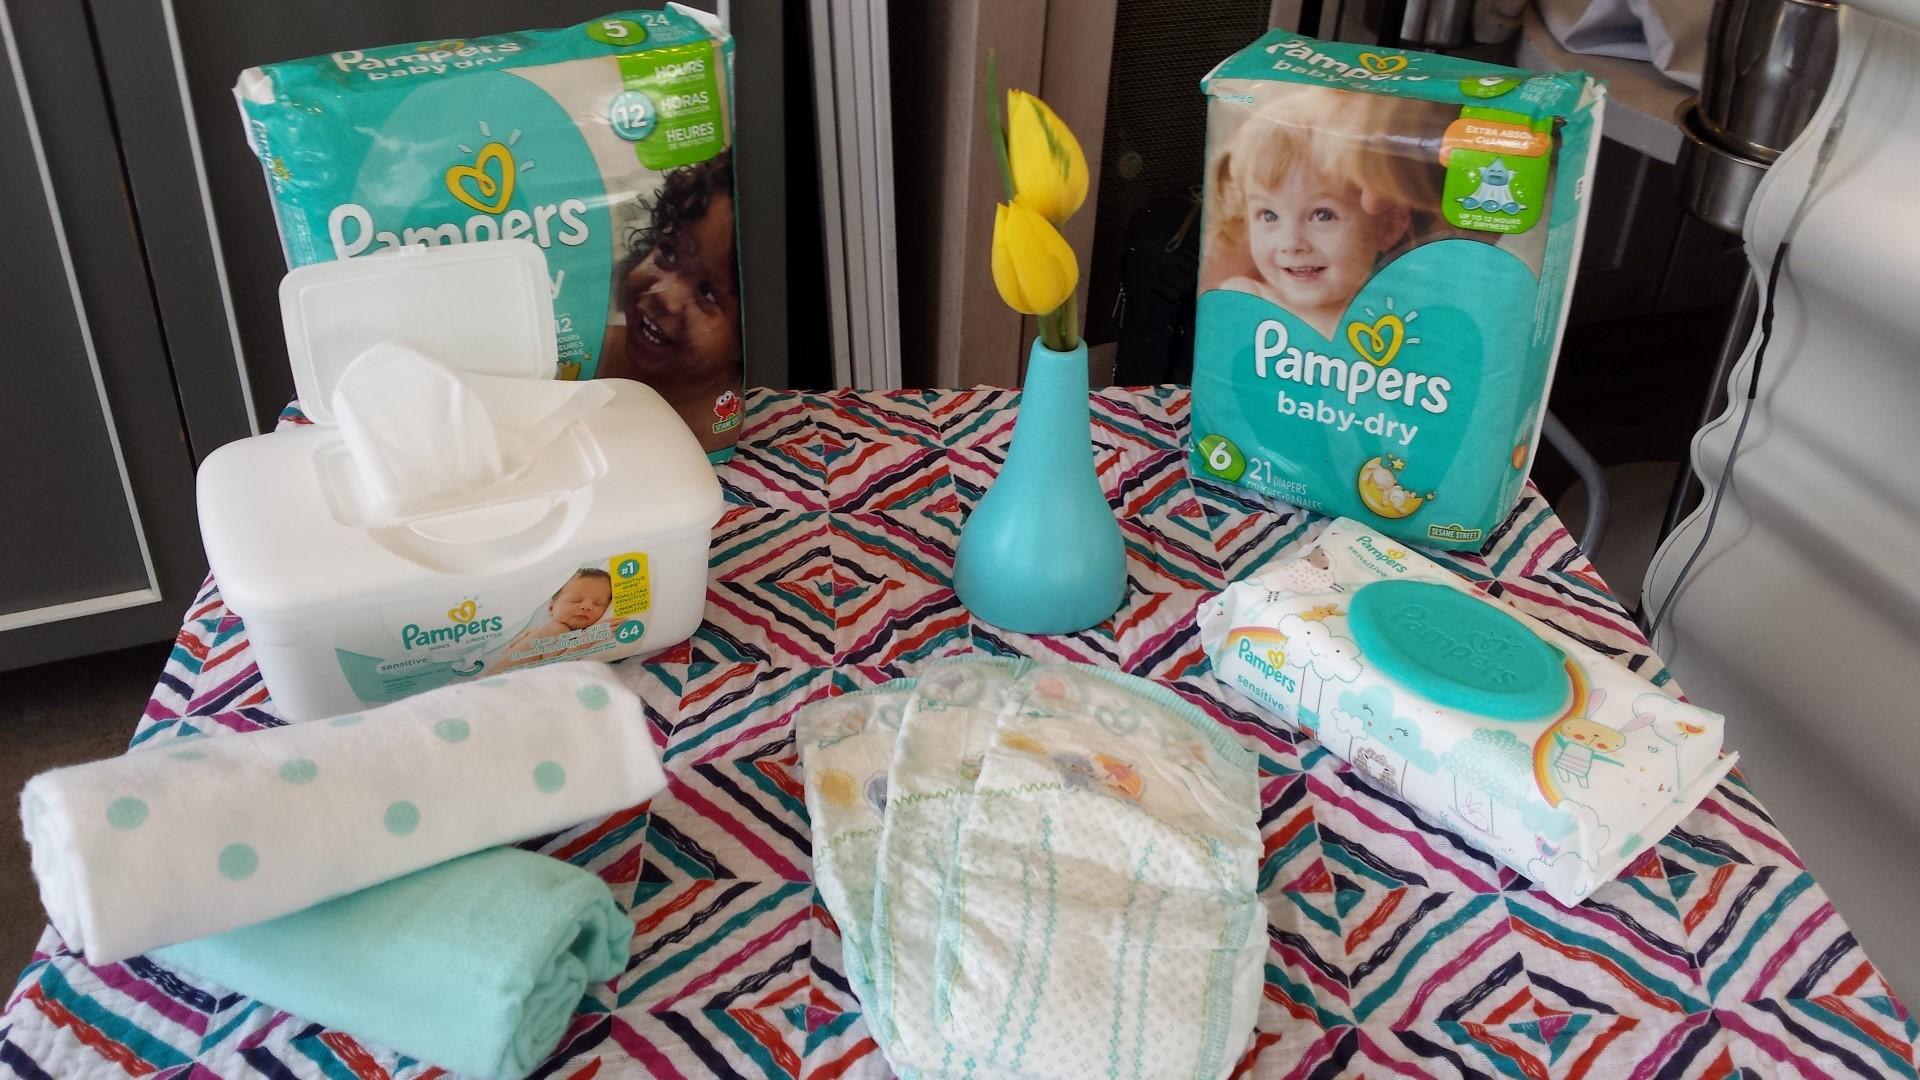 Pampers Comfort #LoveSleepPlay | Giveaway